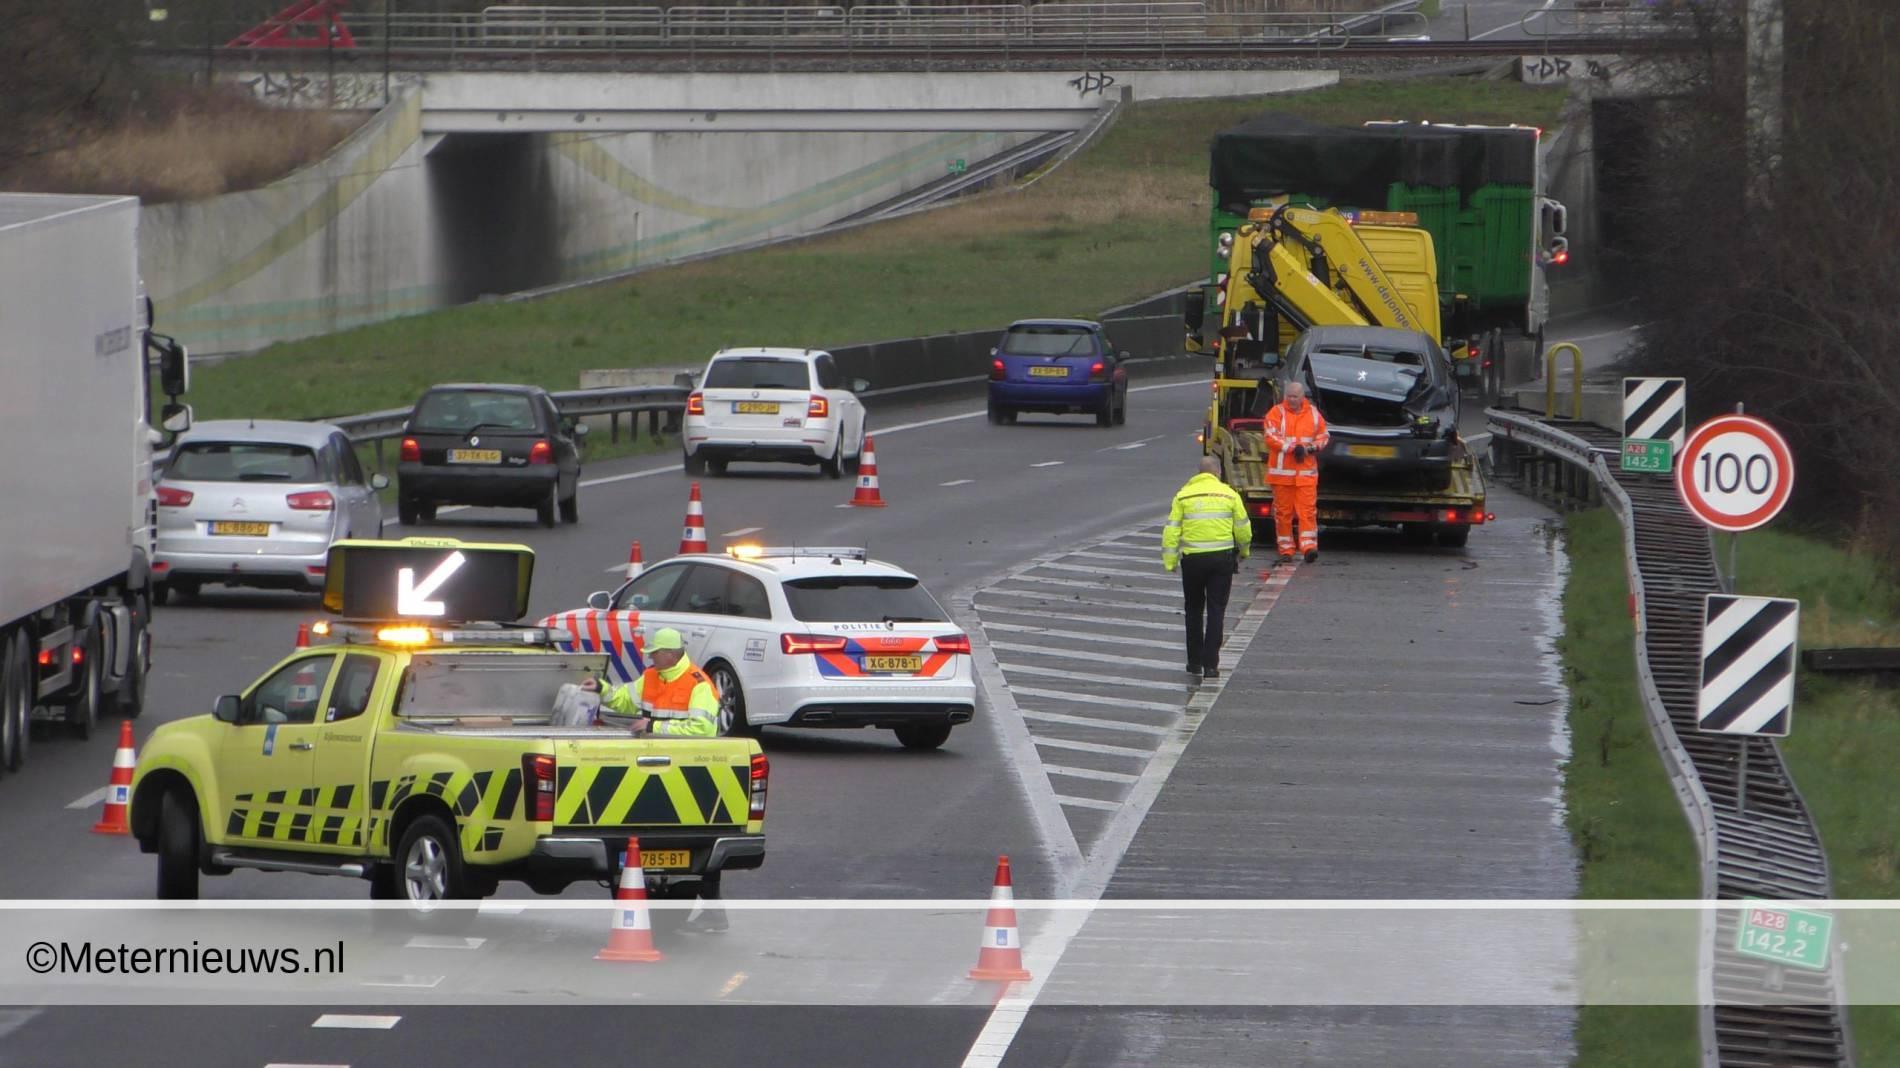 ongeval a28 Hoogeveen